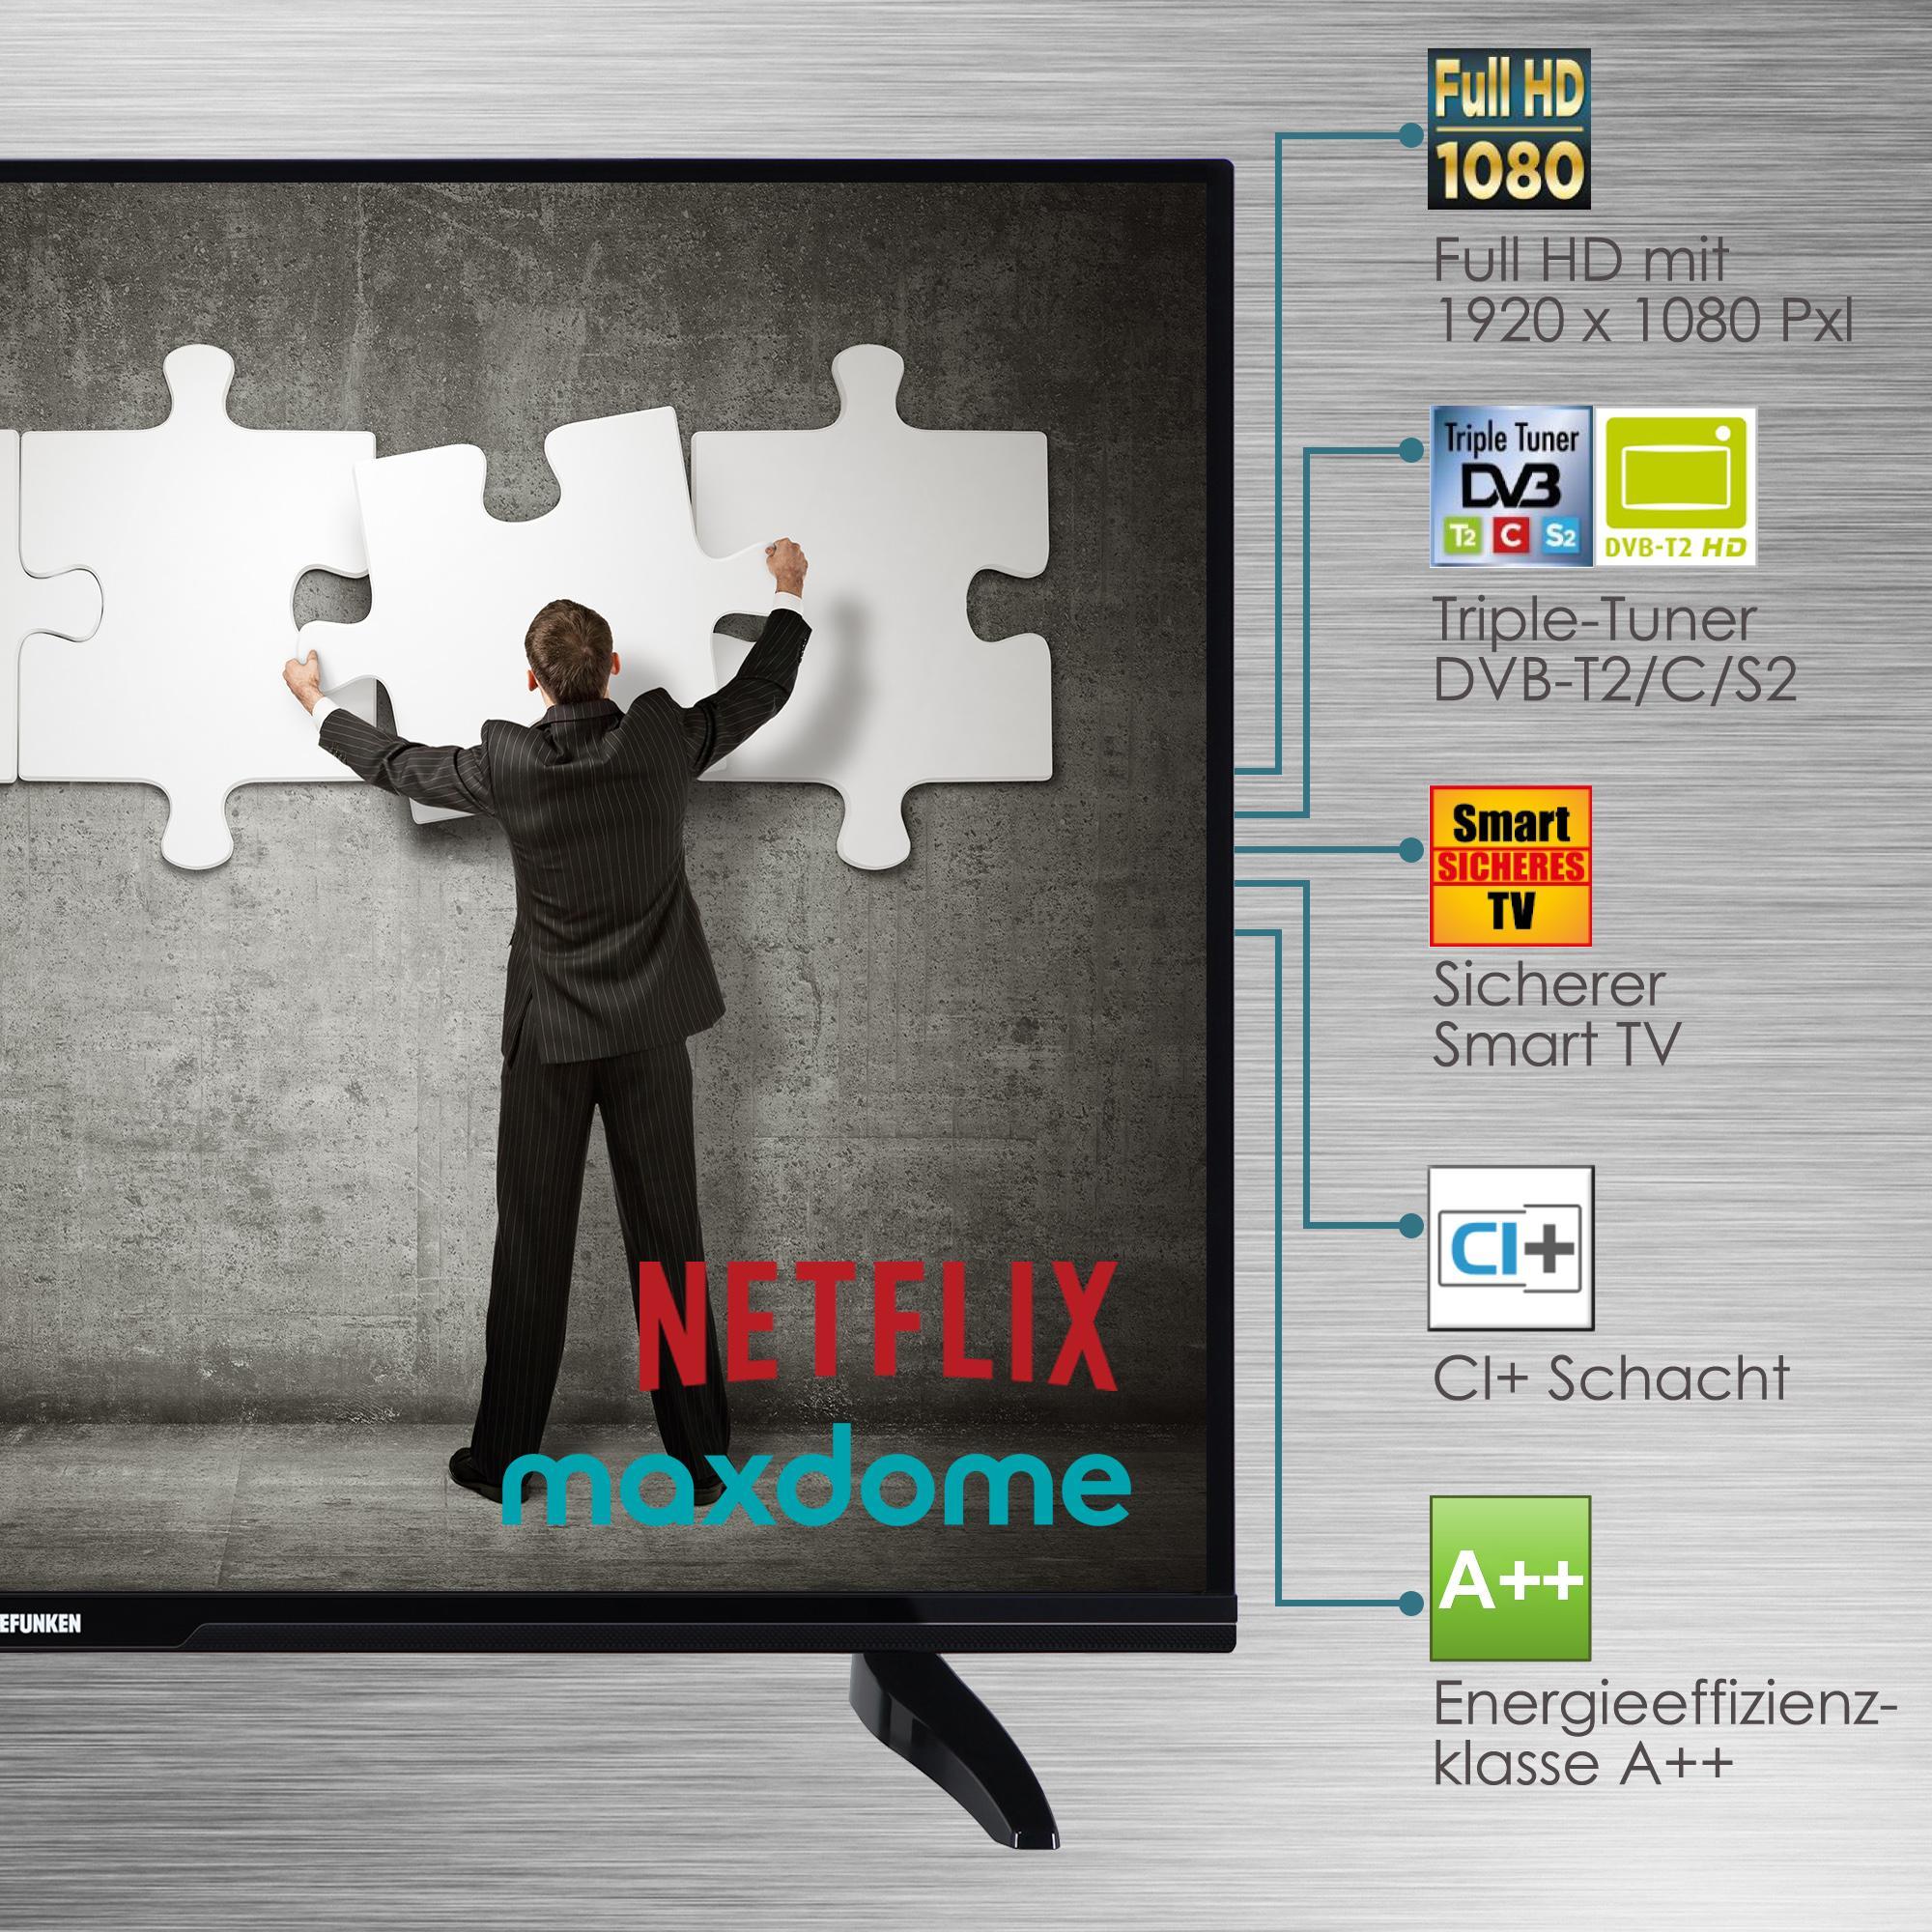 telefunken xf43d401 110 cm 43 zoll fernseher full hd smart tv triple tuner. Black Bedroom Furniture Sets. Home Design Ideas